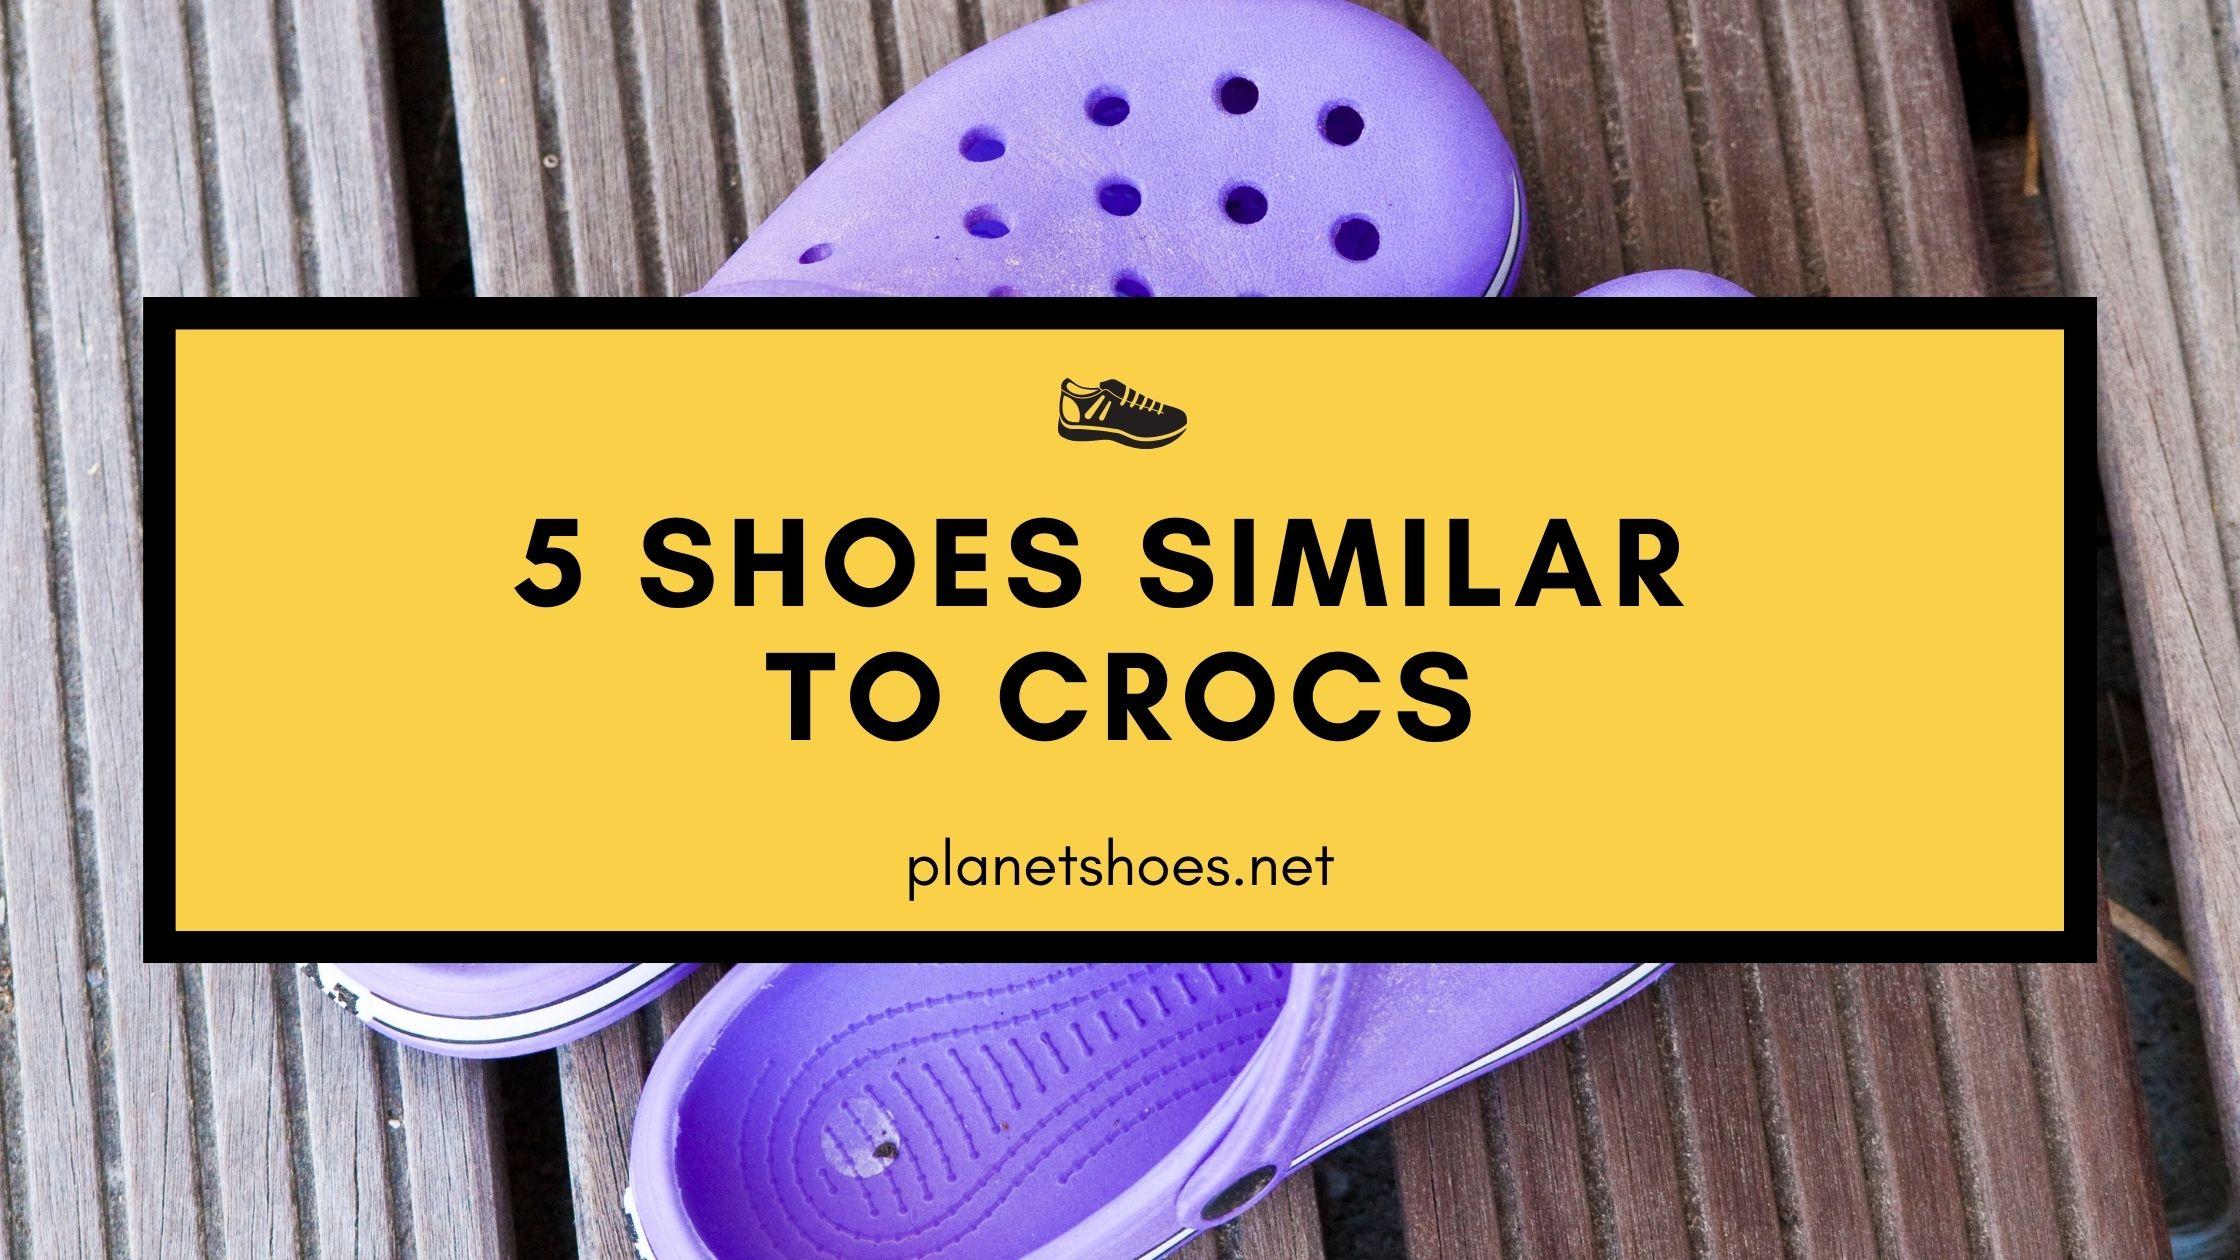 PS-5-shoes-similar-to-crocs